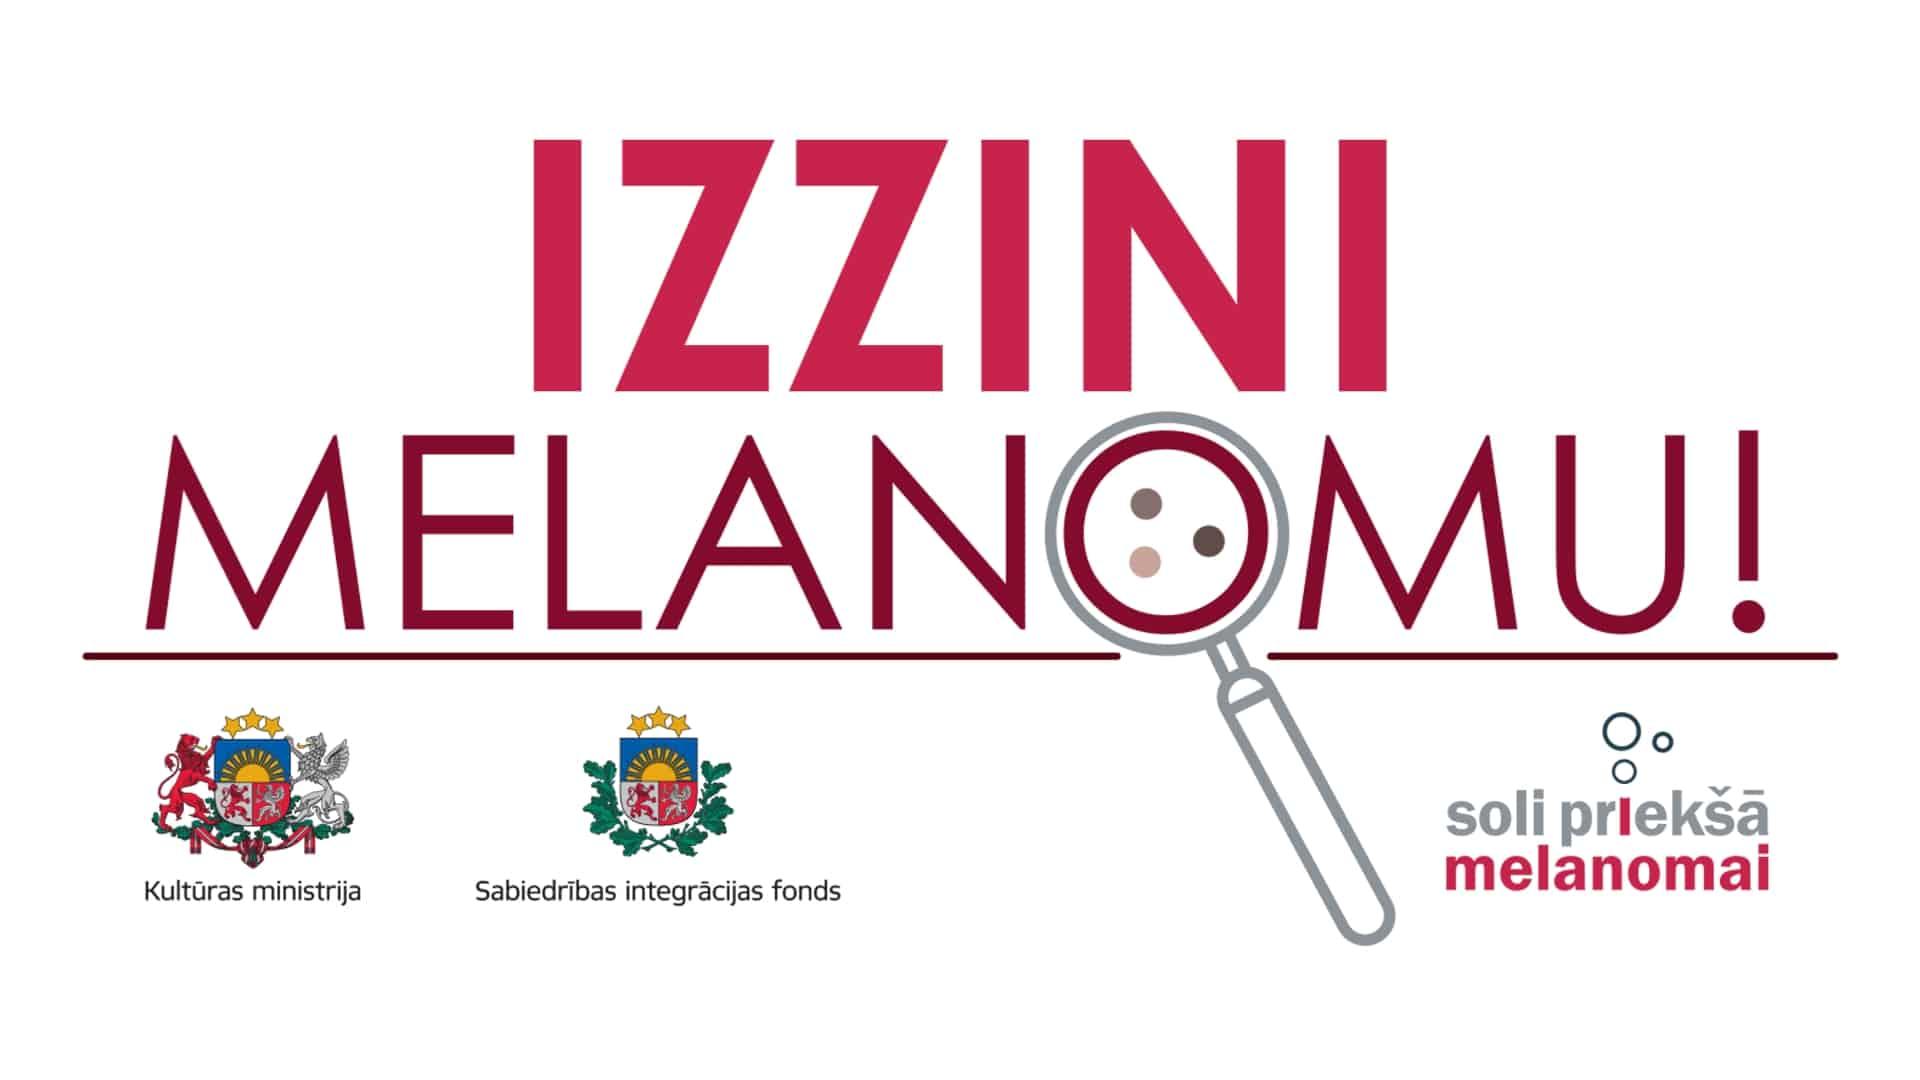 Izzini melanomu